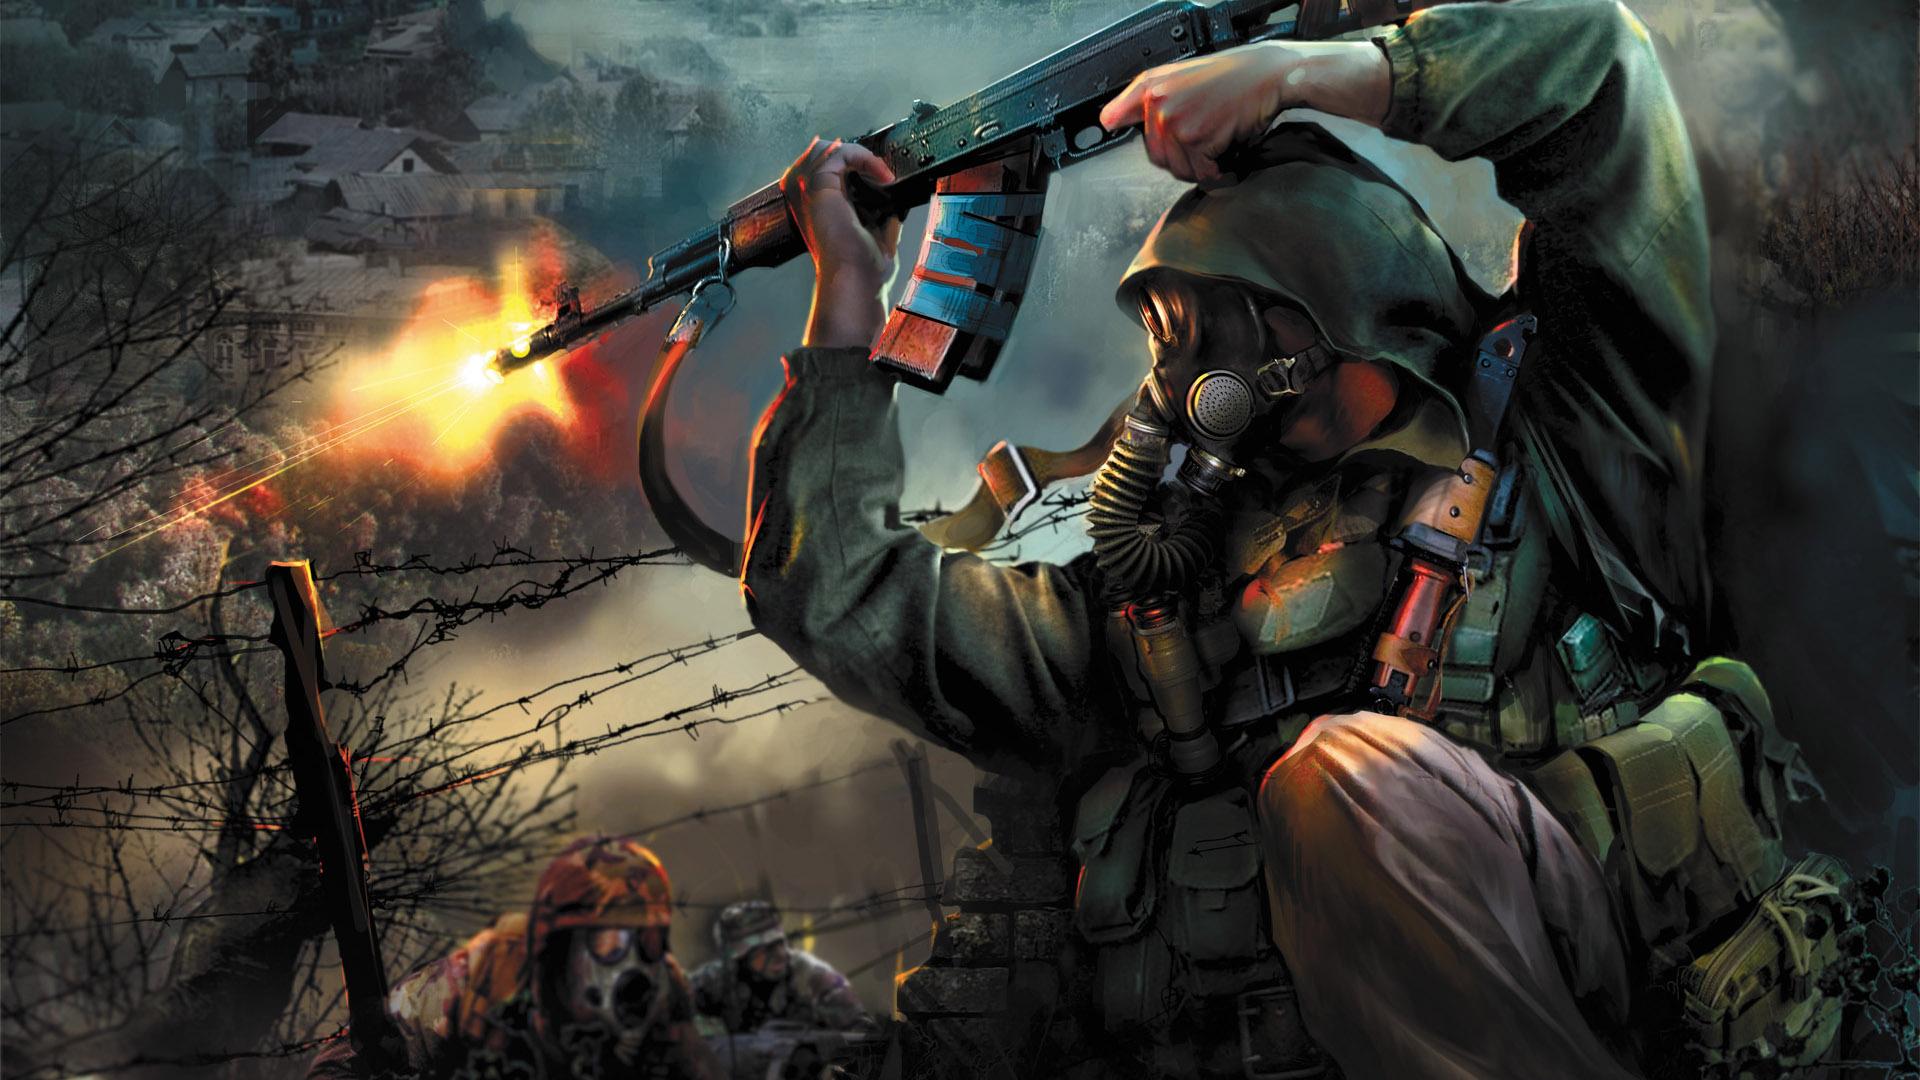 War Wallpapers   Gameplayergroup 1920x1080